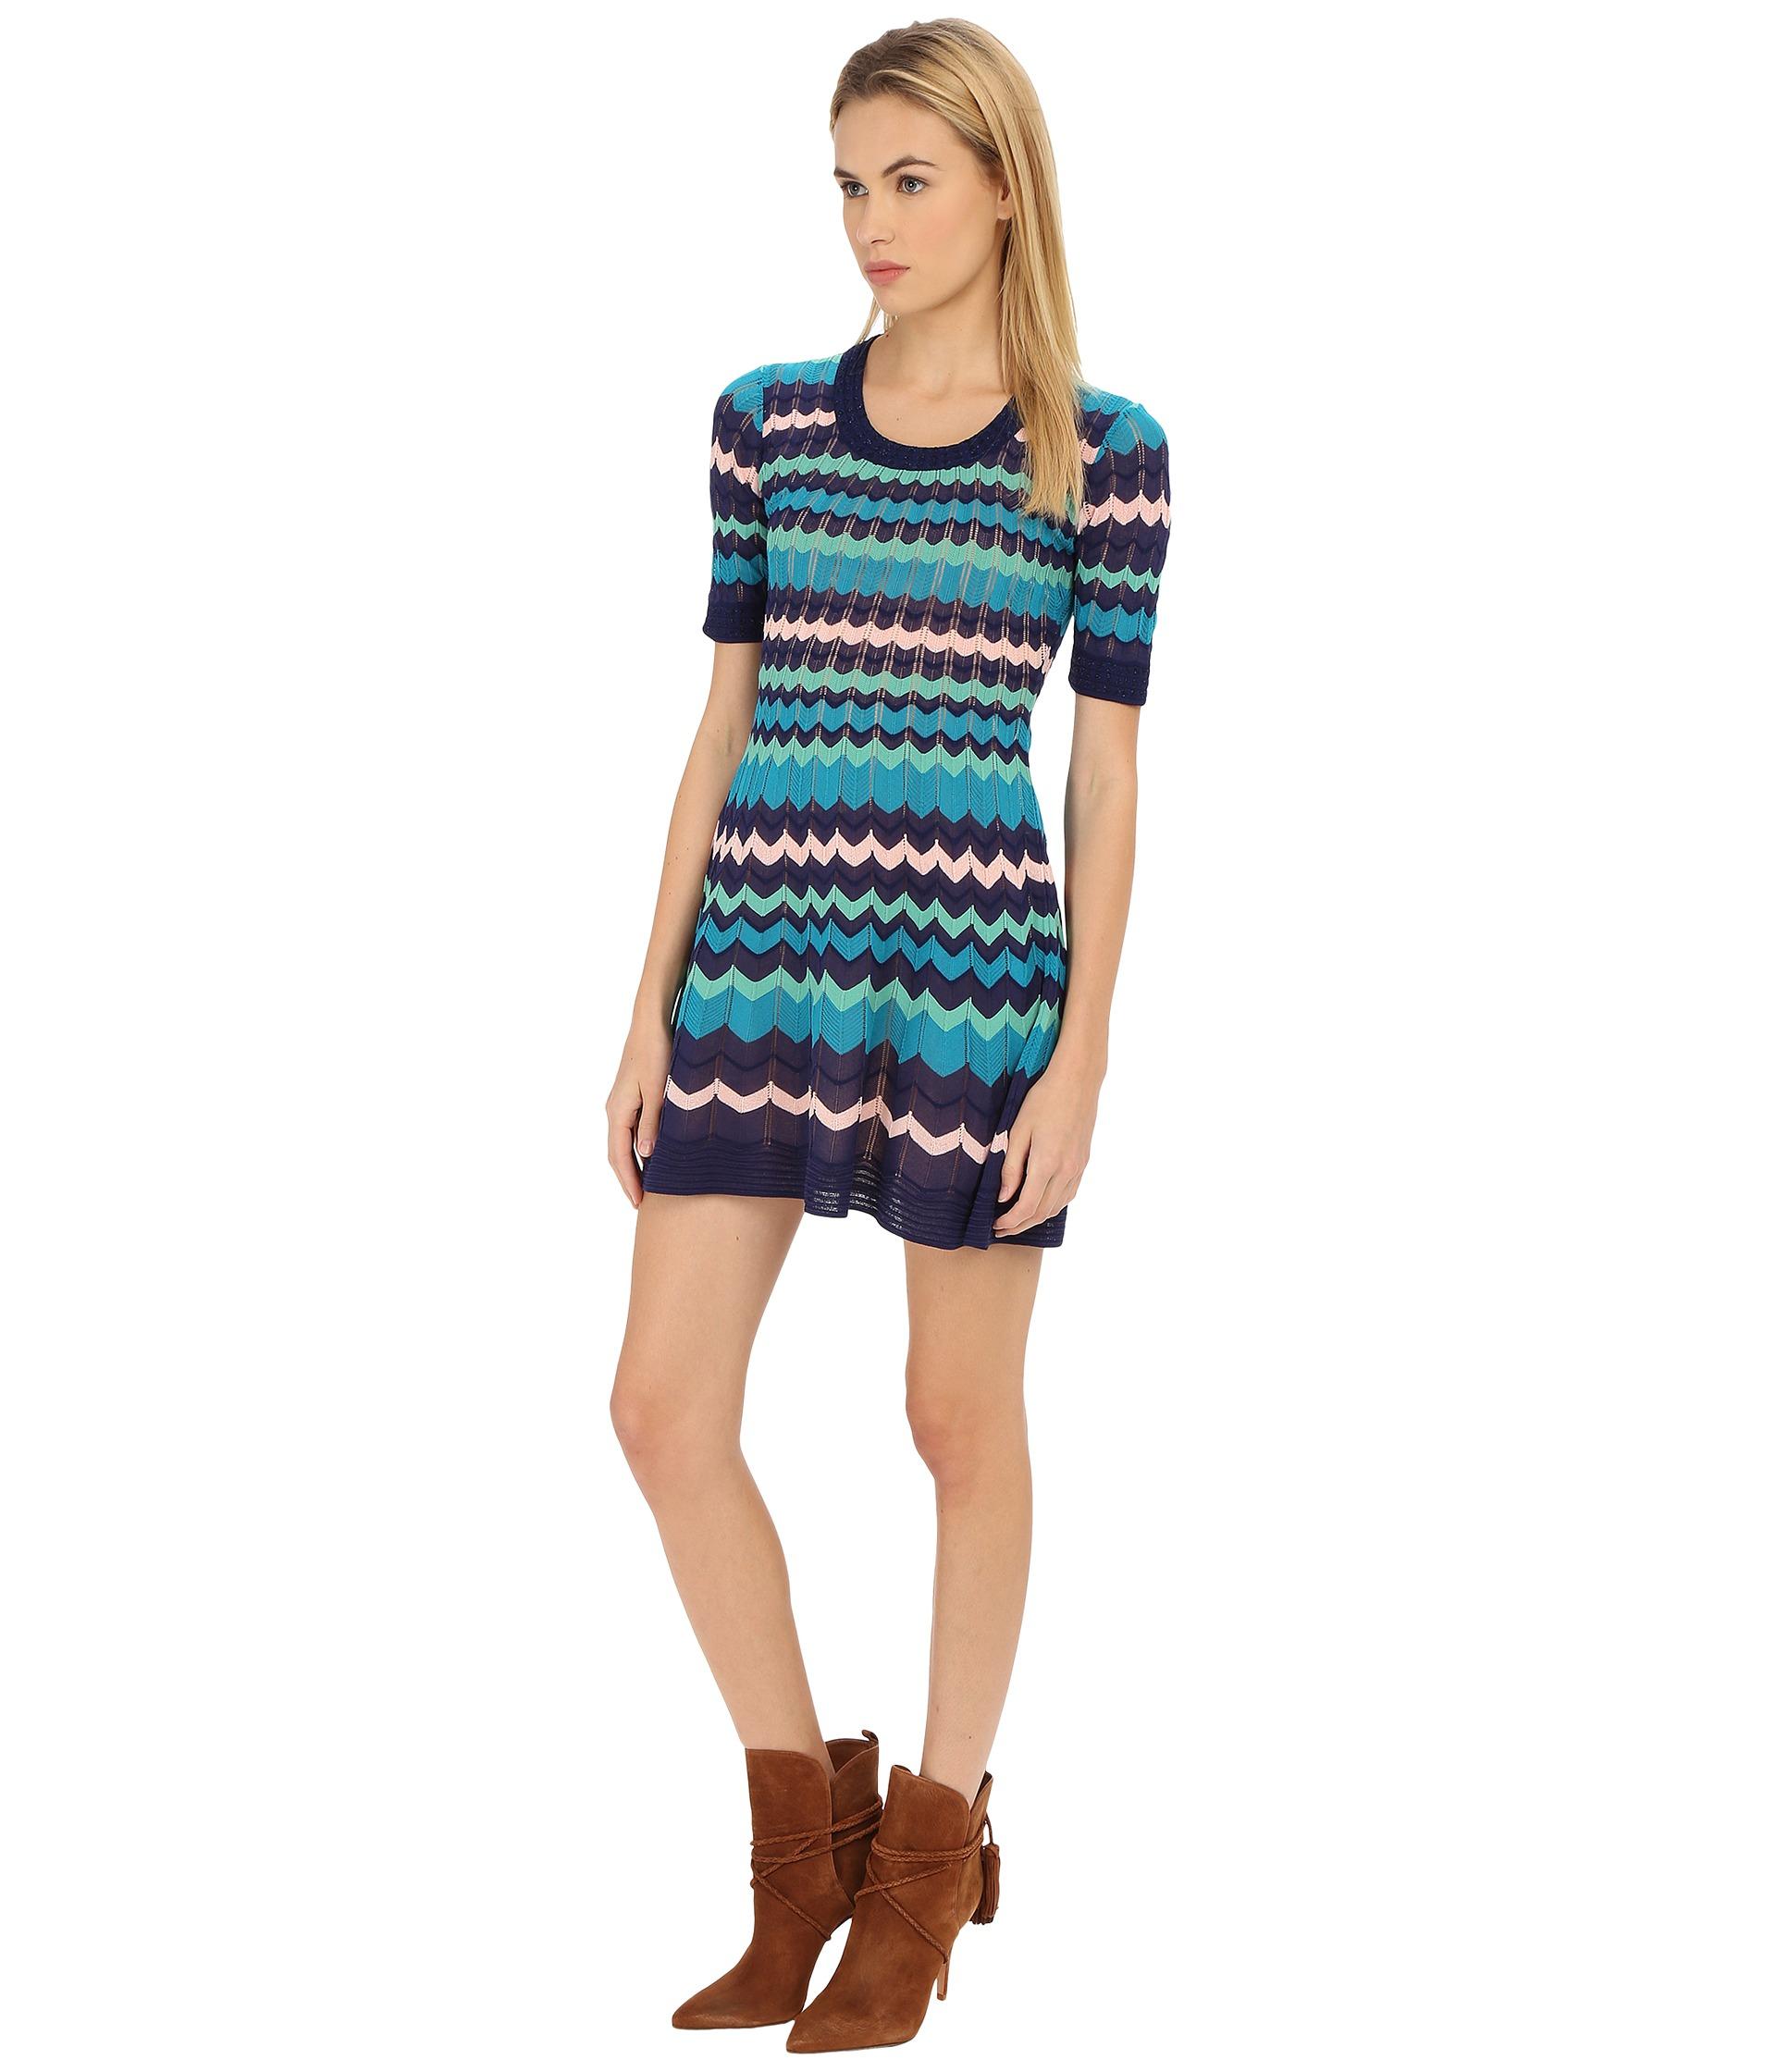 759517432b Lyst - M Missoni Color Block 3 4 Sleeve Dress in Blue